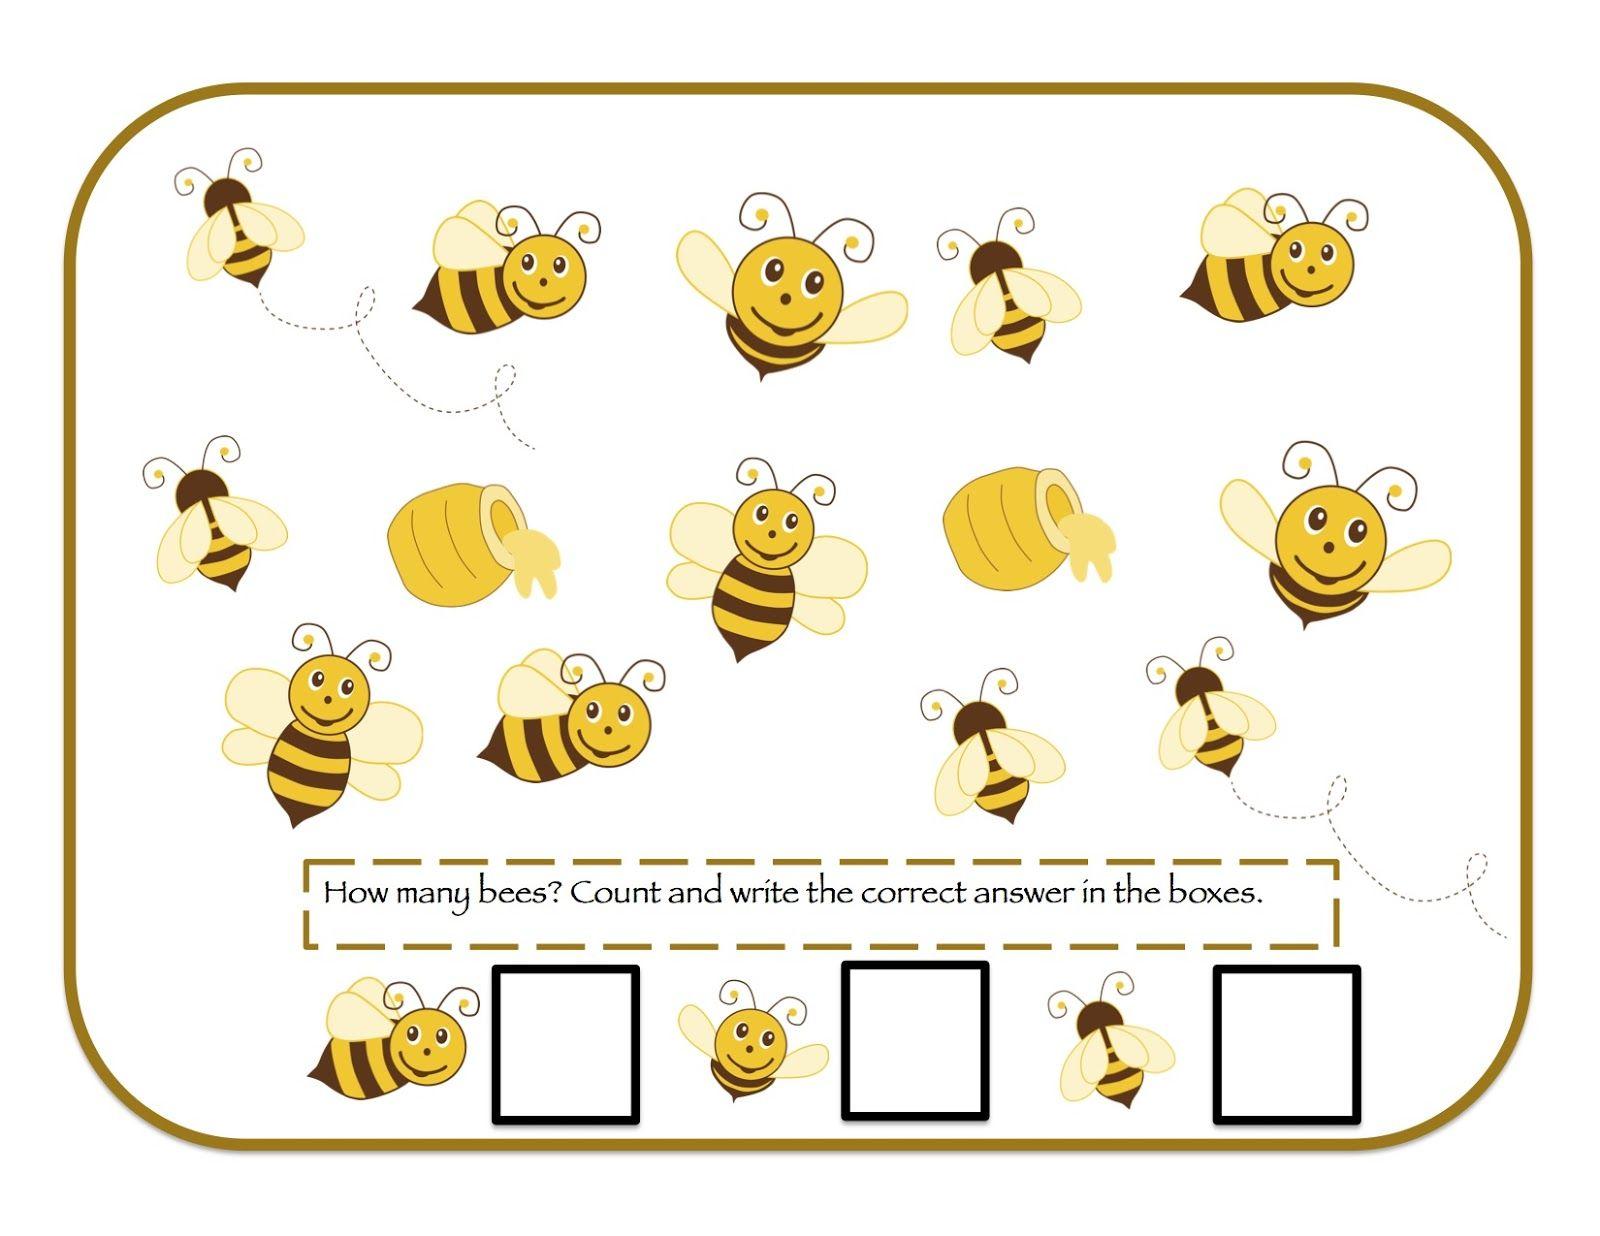 preschool printables bee bear printable d 39 b ien pinterest preschool printables and bees. Black Bedroom Furniture Sets. Home Design Ideas